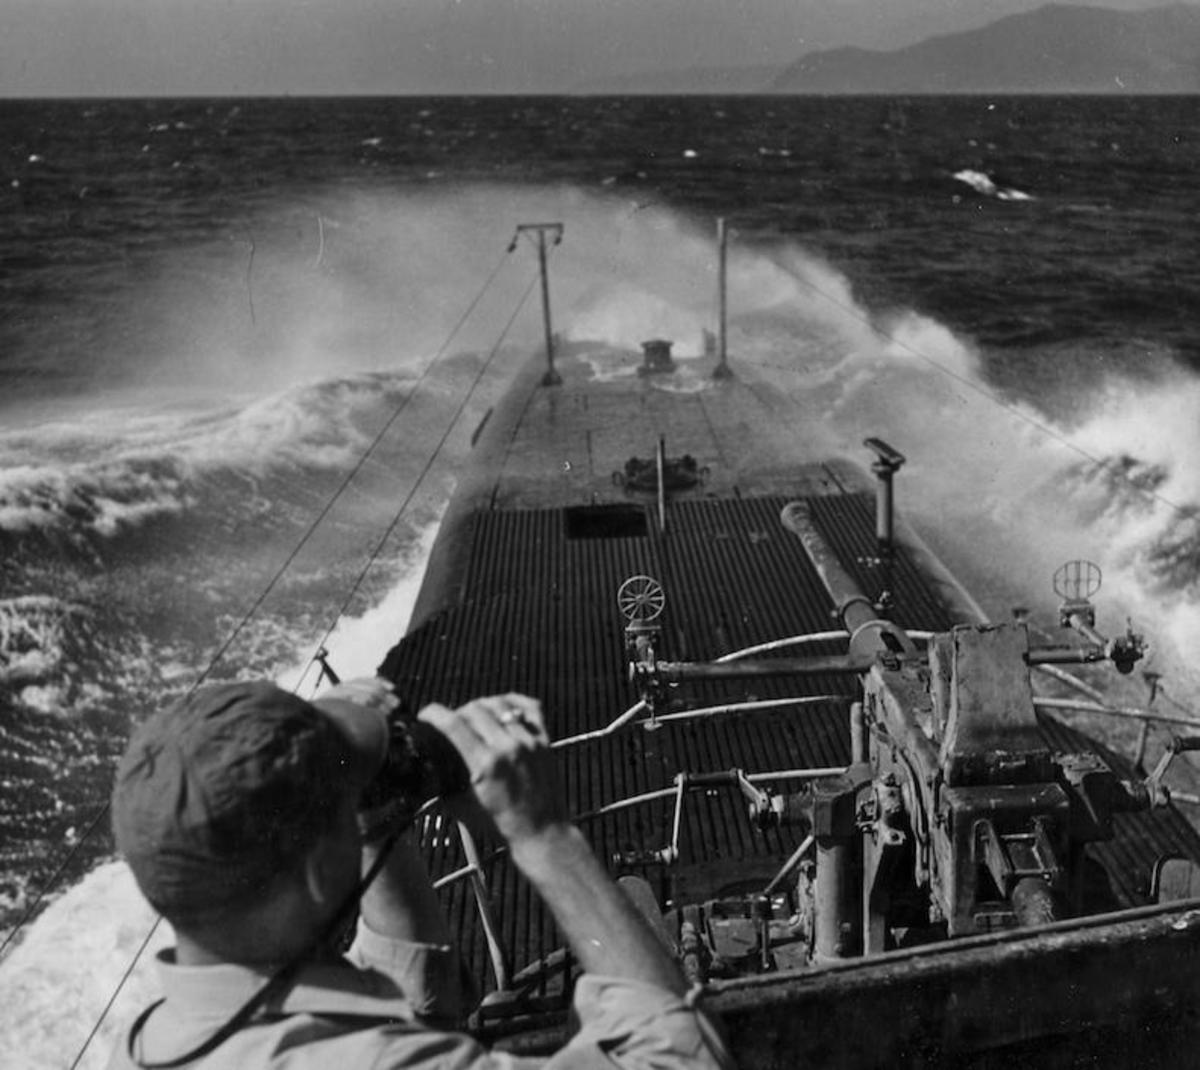 The Submarine Killer: USS Batfish in Muskogee, Oklahoma